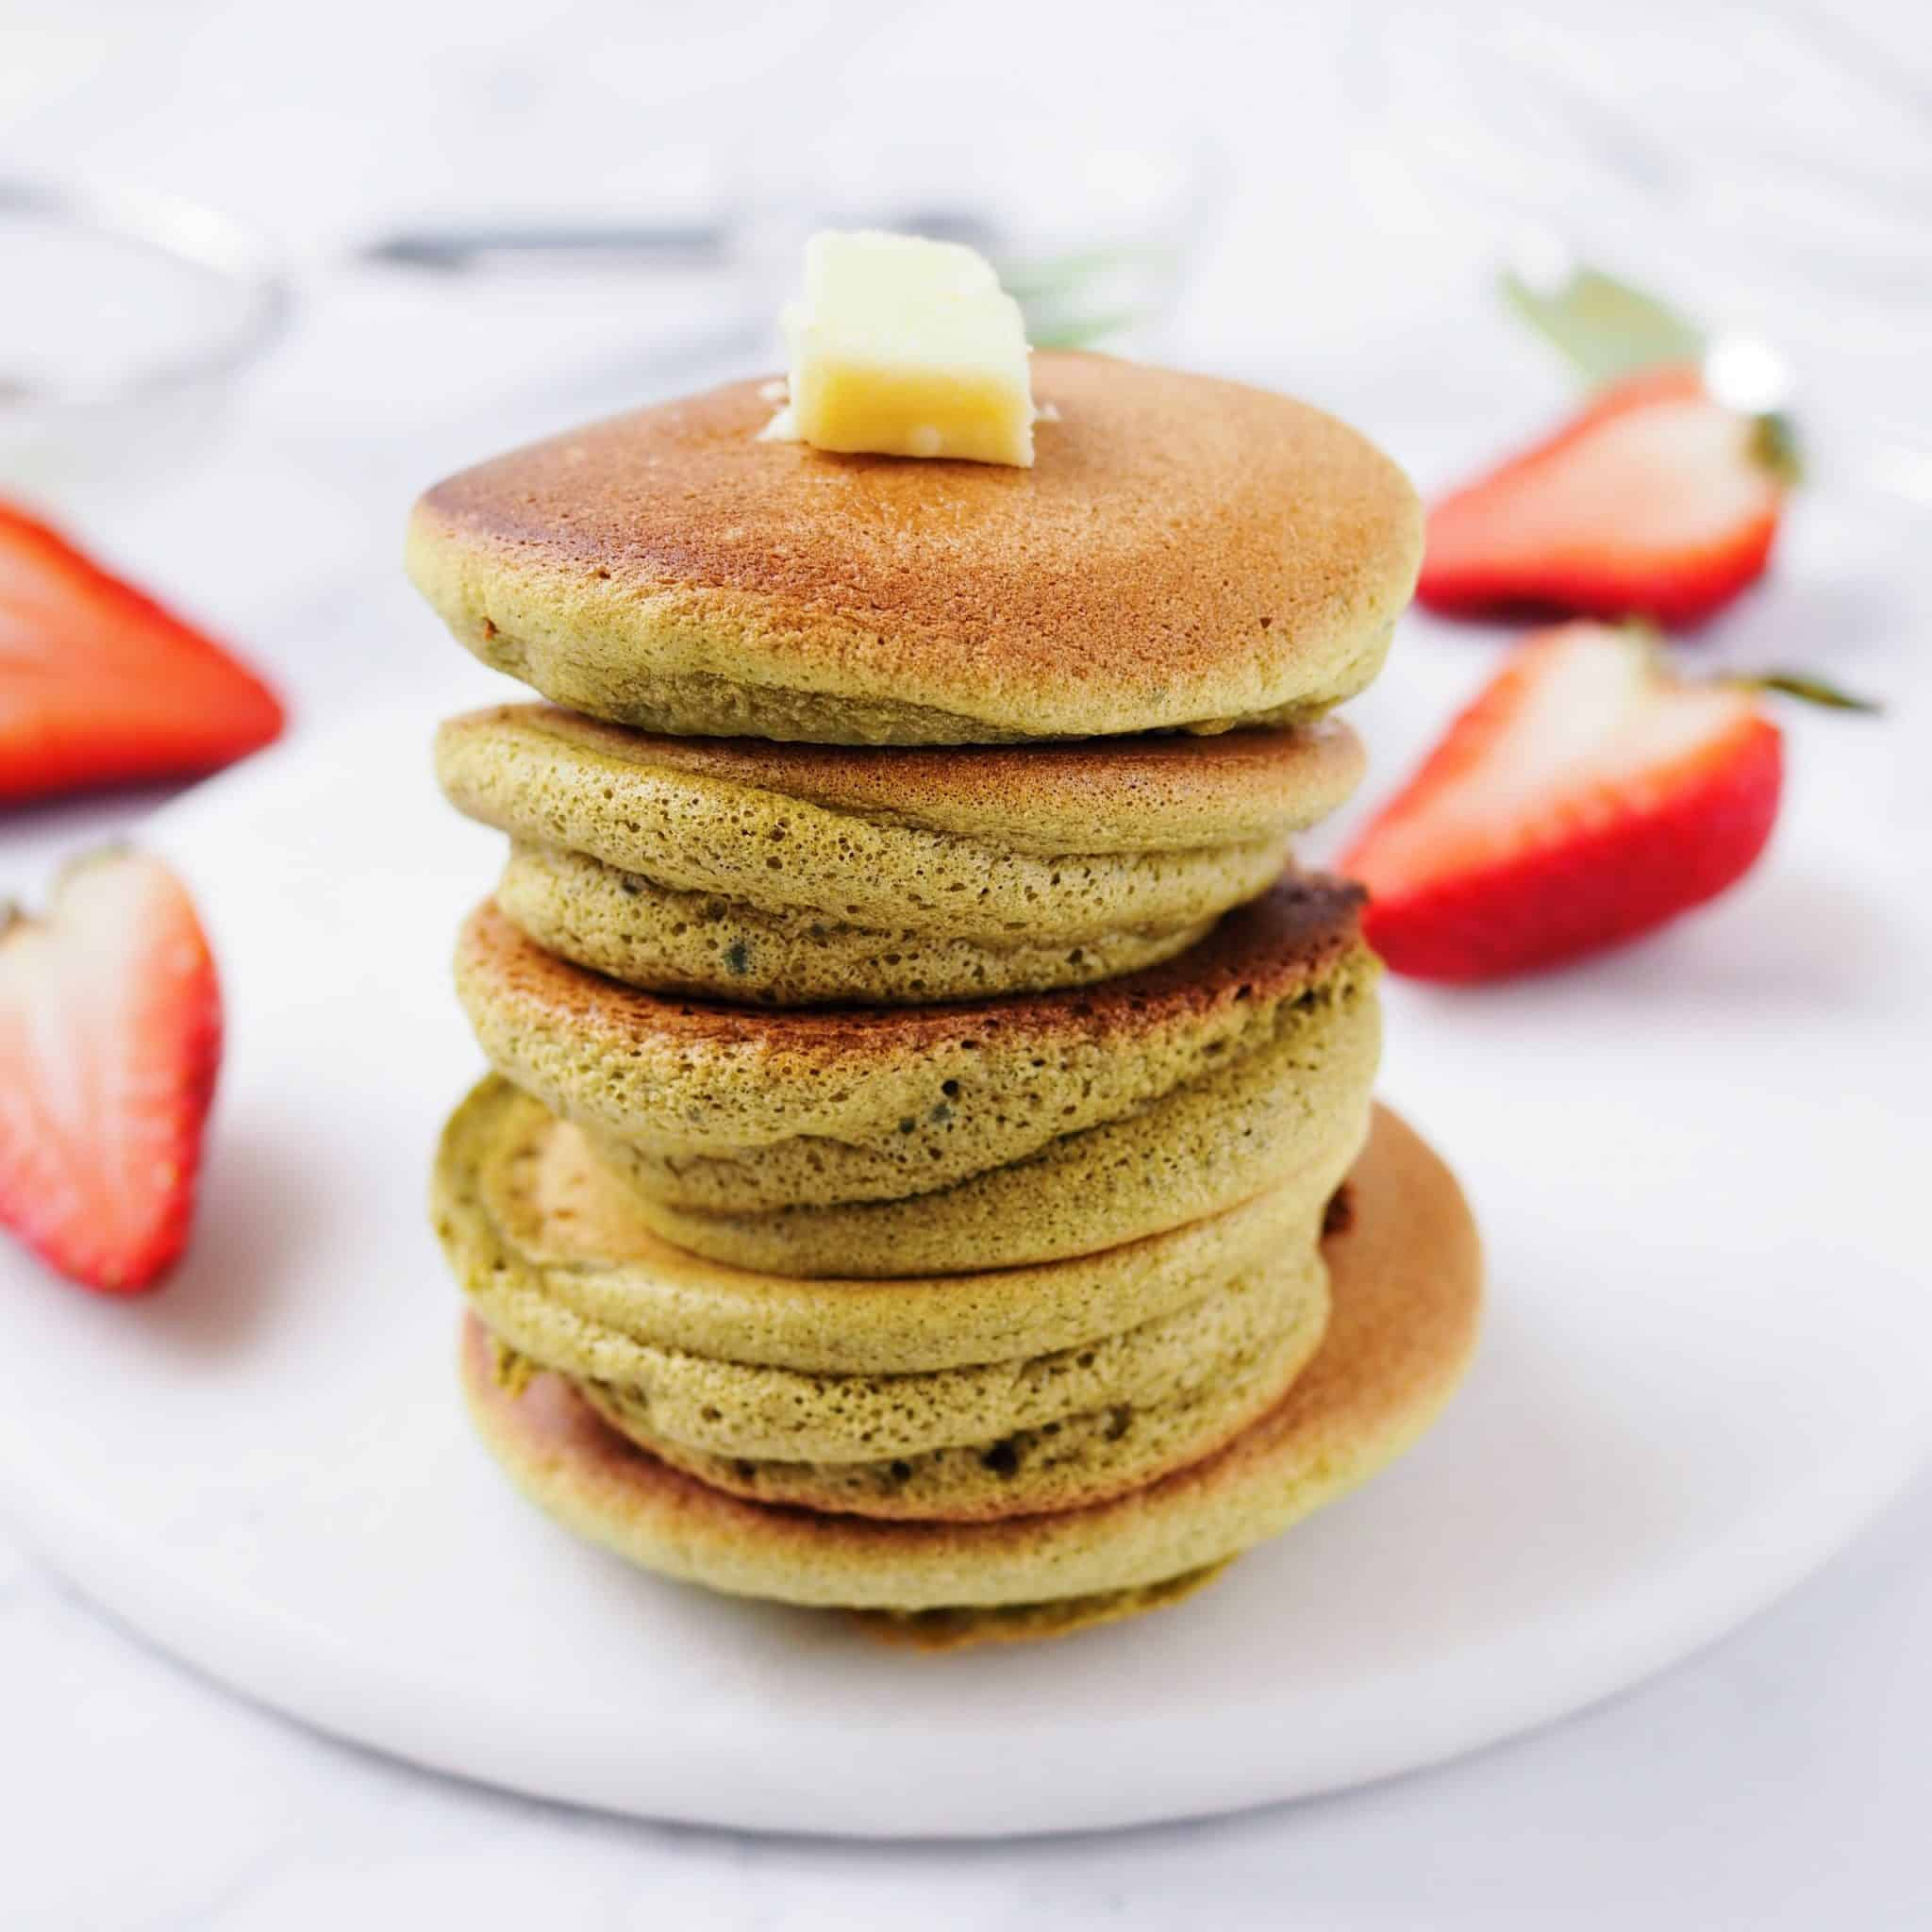 Japanese Matcha Souffle Pancakes